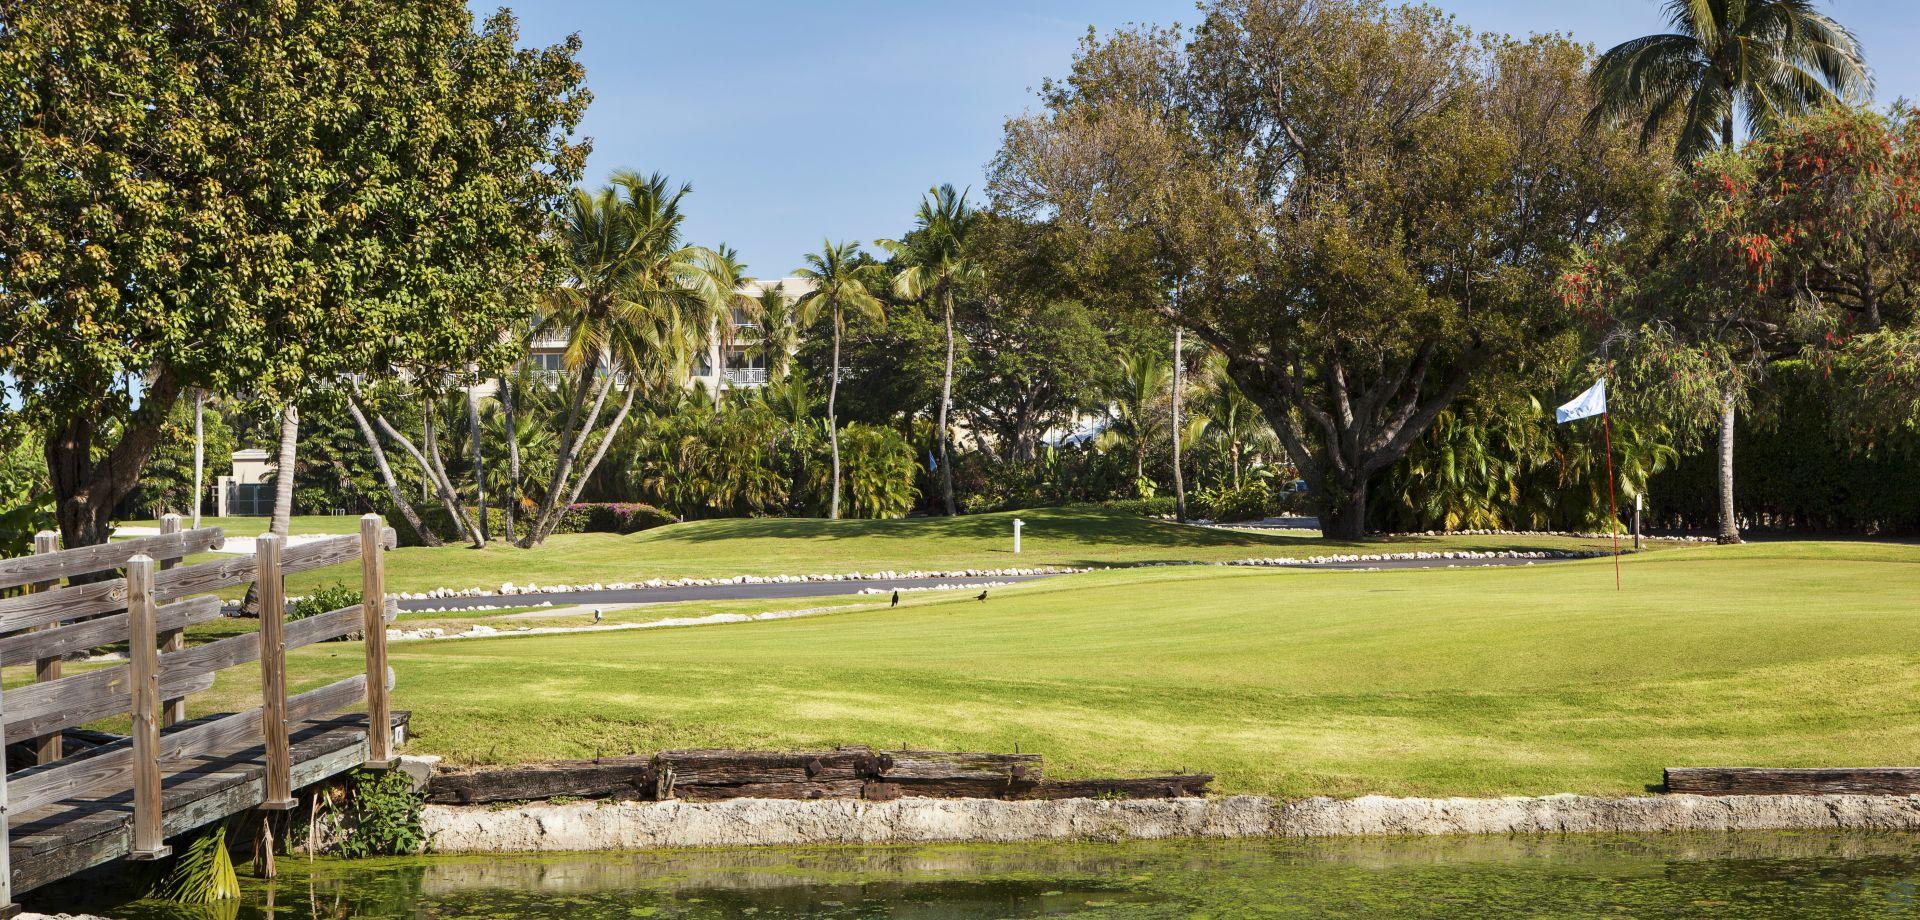 Florida Keys Golf Courses | Cheeca Lodge on hershey lodge map, kalaloch lodge map, snake river lodge map, el silencio lodge map, stein eriksen lodge map, cedar breaks lodge map, yosemite lodge map, stowe mountain lodge map,